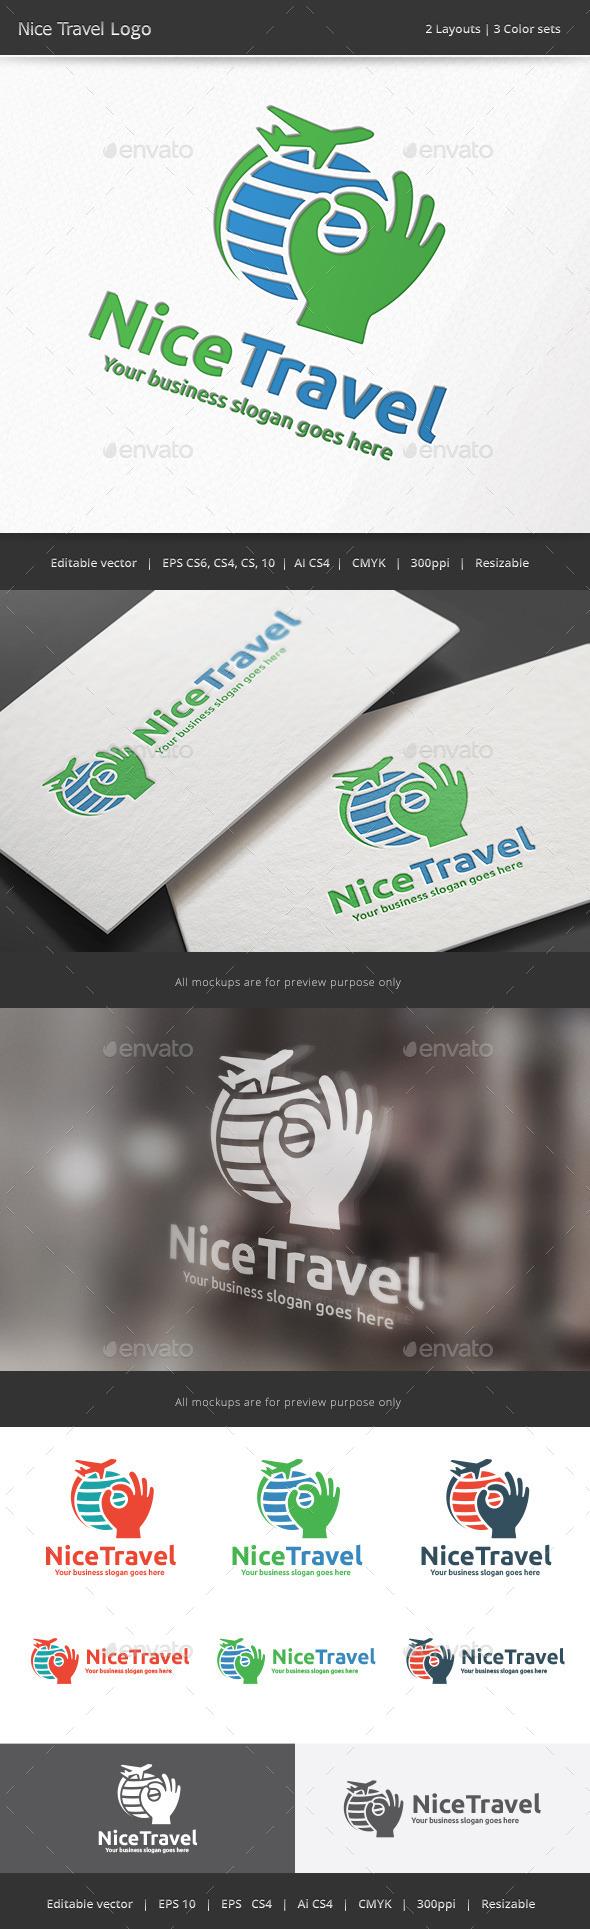 Nice Travel Logo - Vector Abstract